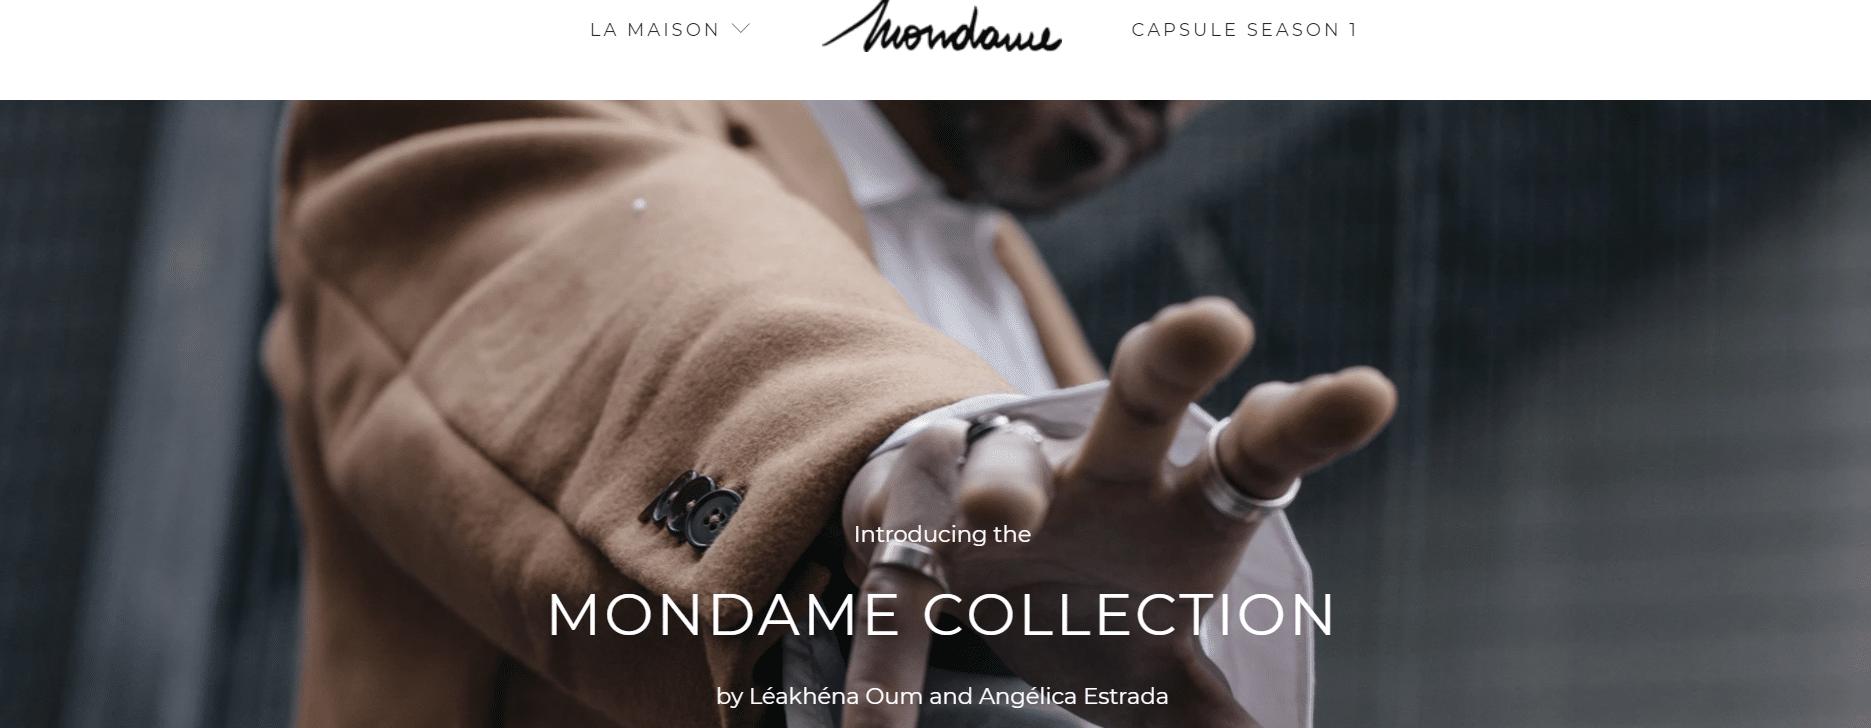 marque streetwear mondame